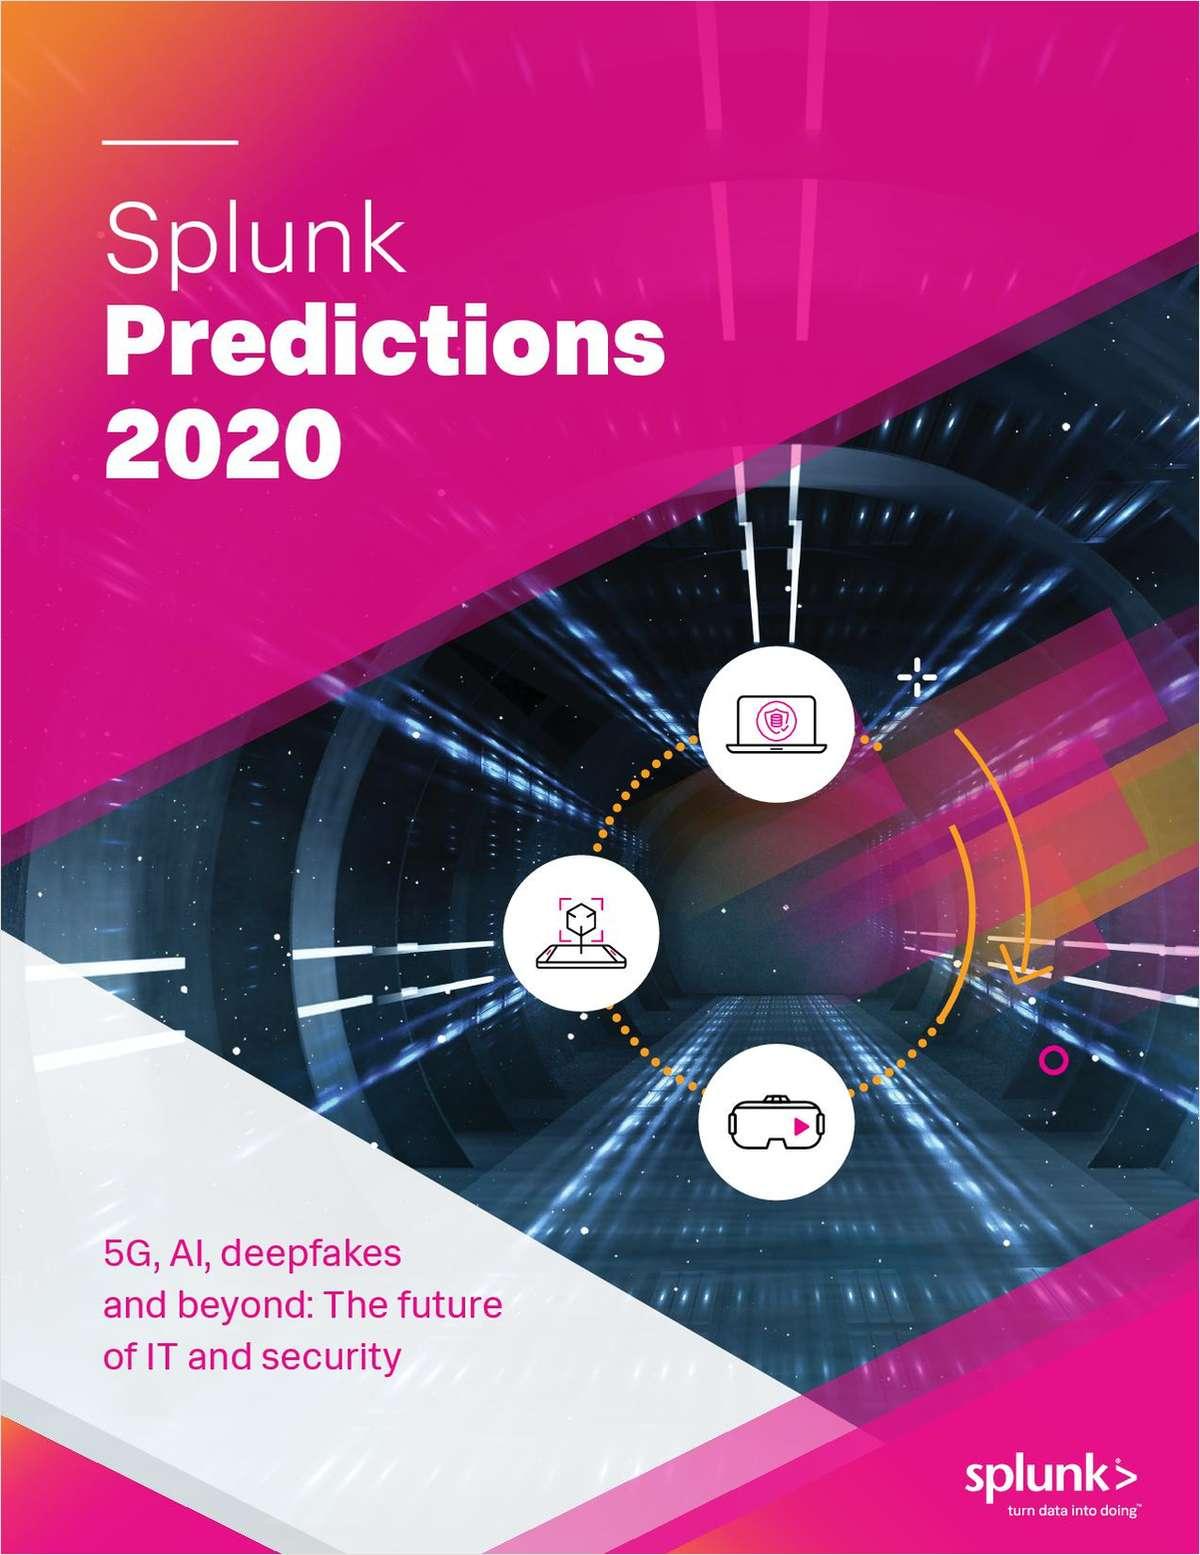 Splunk Predictions 2020